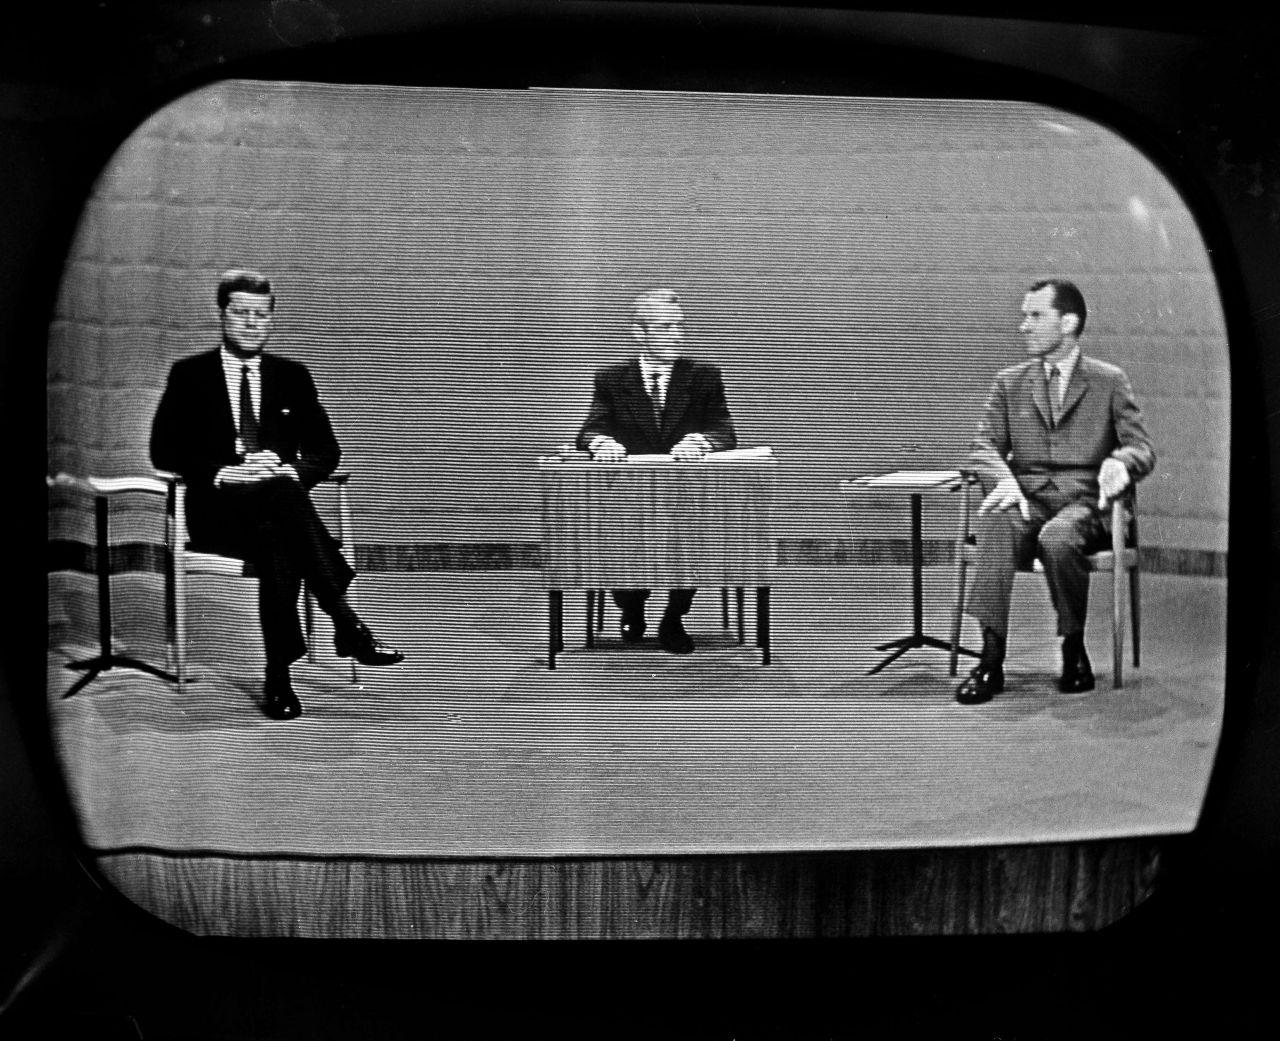 John F. Kennedy und Richard Nixon TV Duell